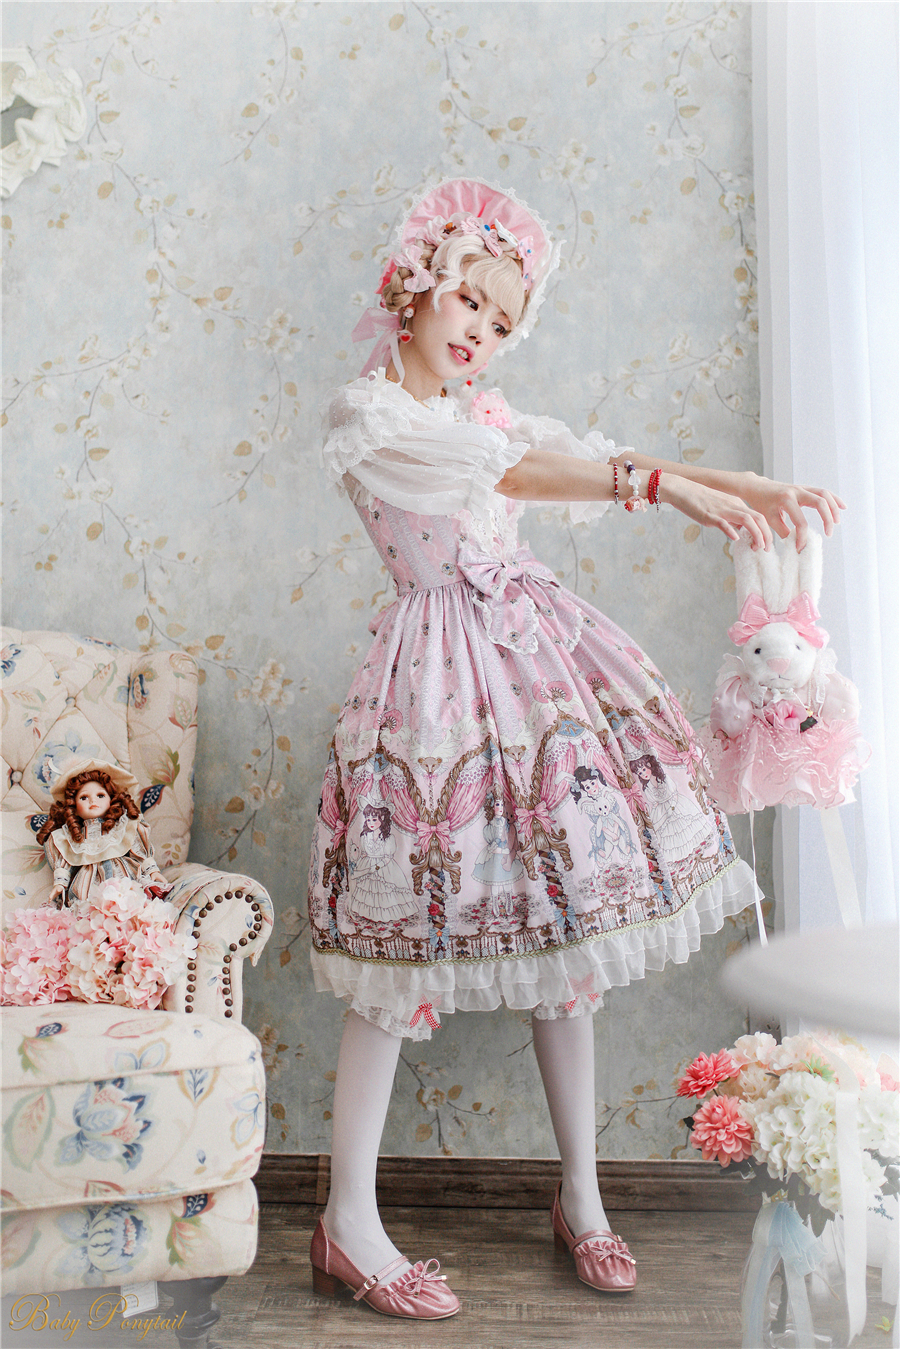 BabyPonytail_Model Photo_My Favorite Companion_JSK Pink_Kaka_04.jpg